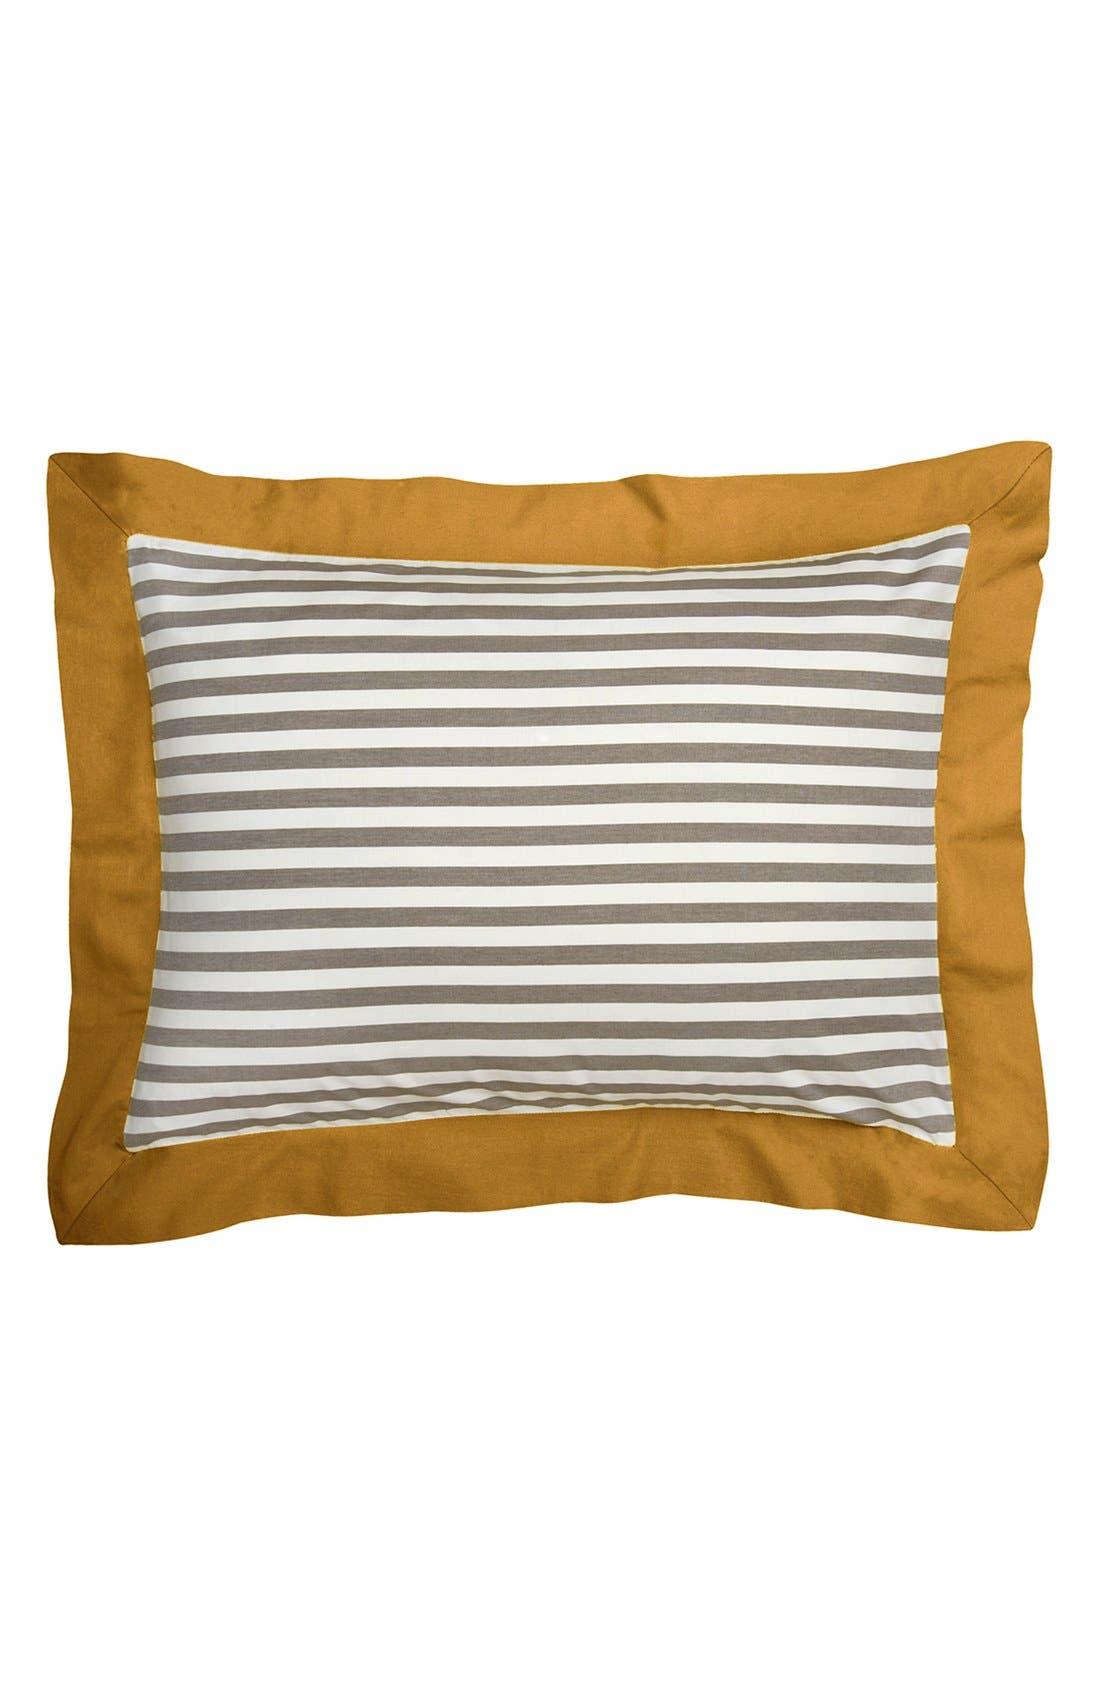 Alternate Image 1 Selected - DwellStudio 'Draper' Stripe Shams (Set of 2)